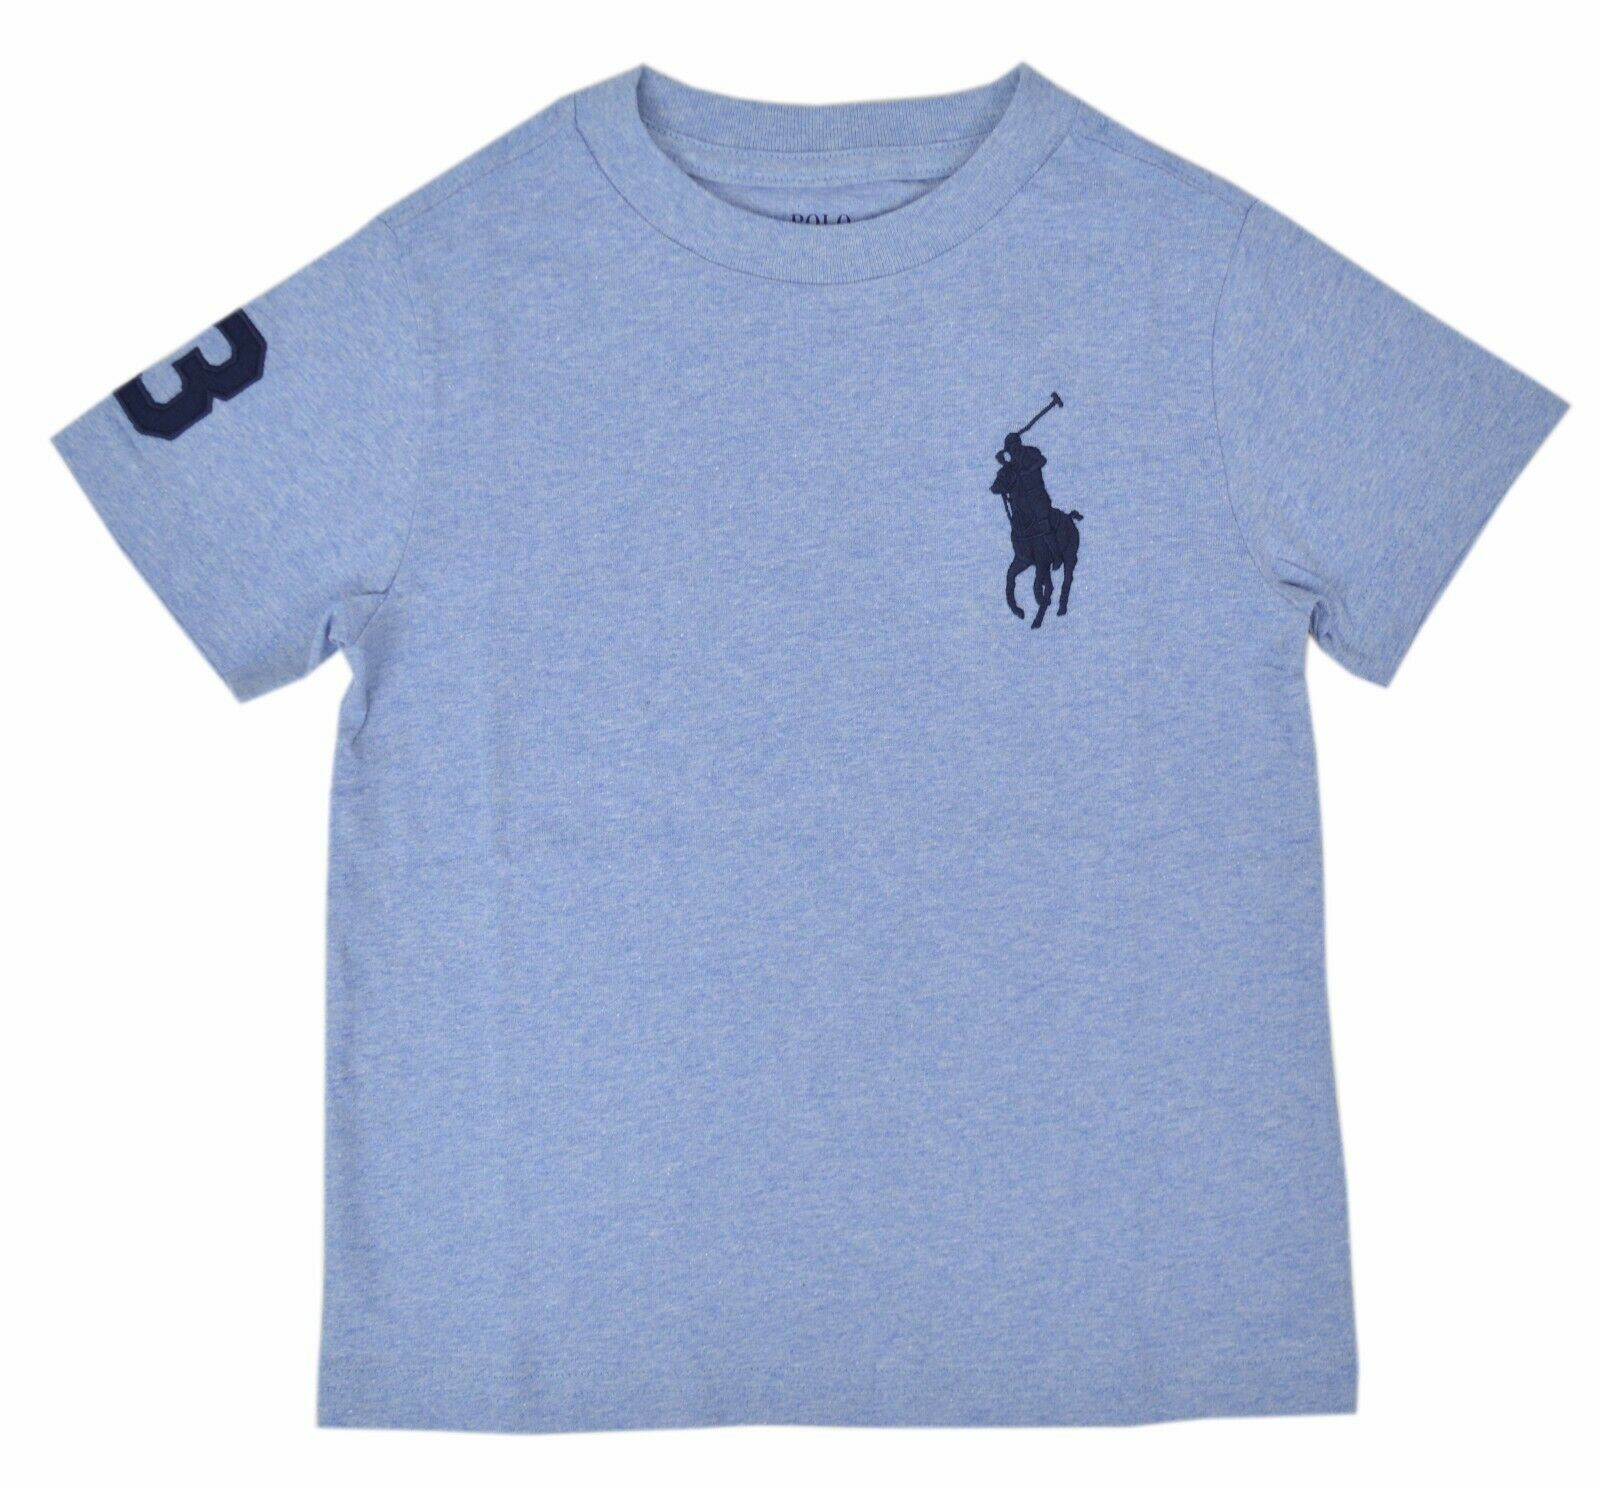 Ralph Lauren Polo Kids Boys Polo Shirts Size S color blue 8